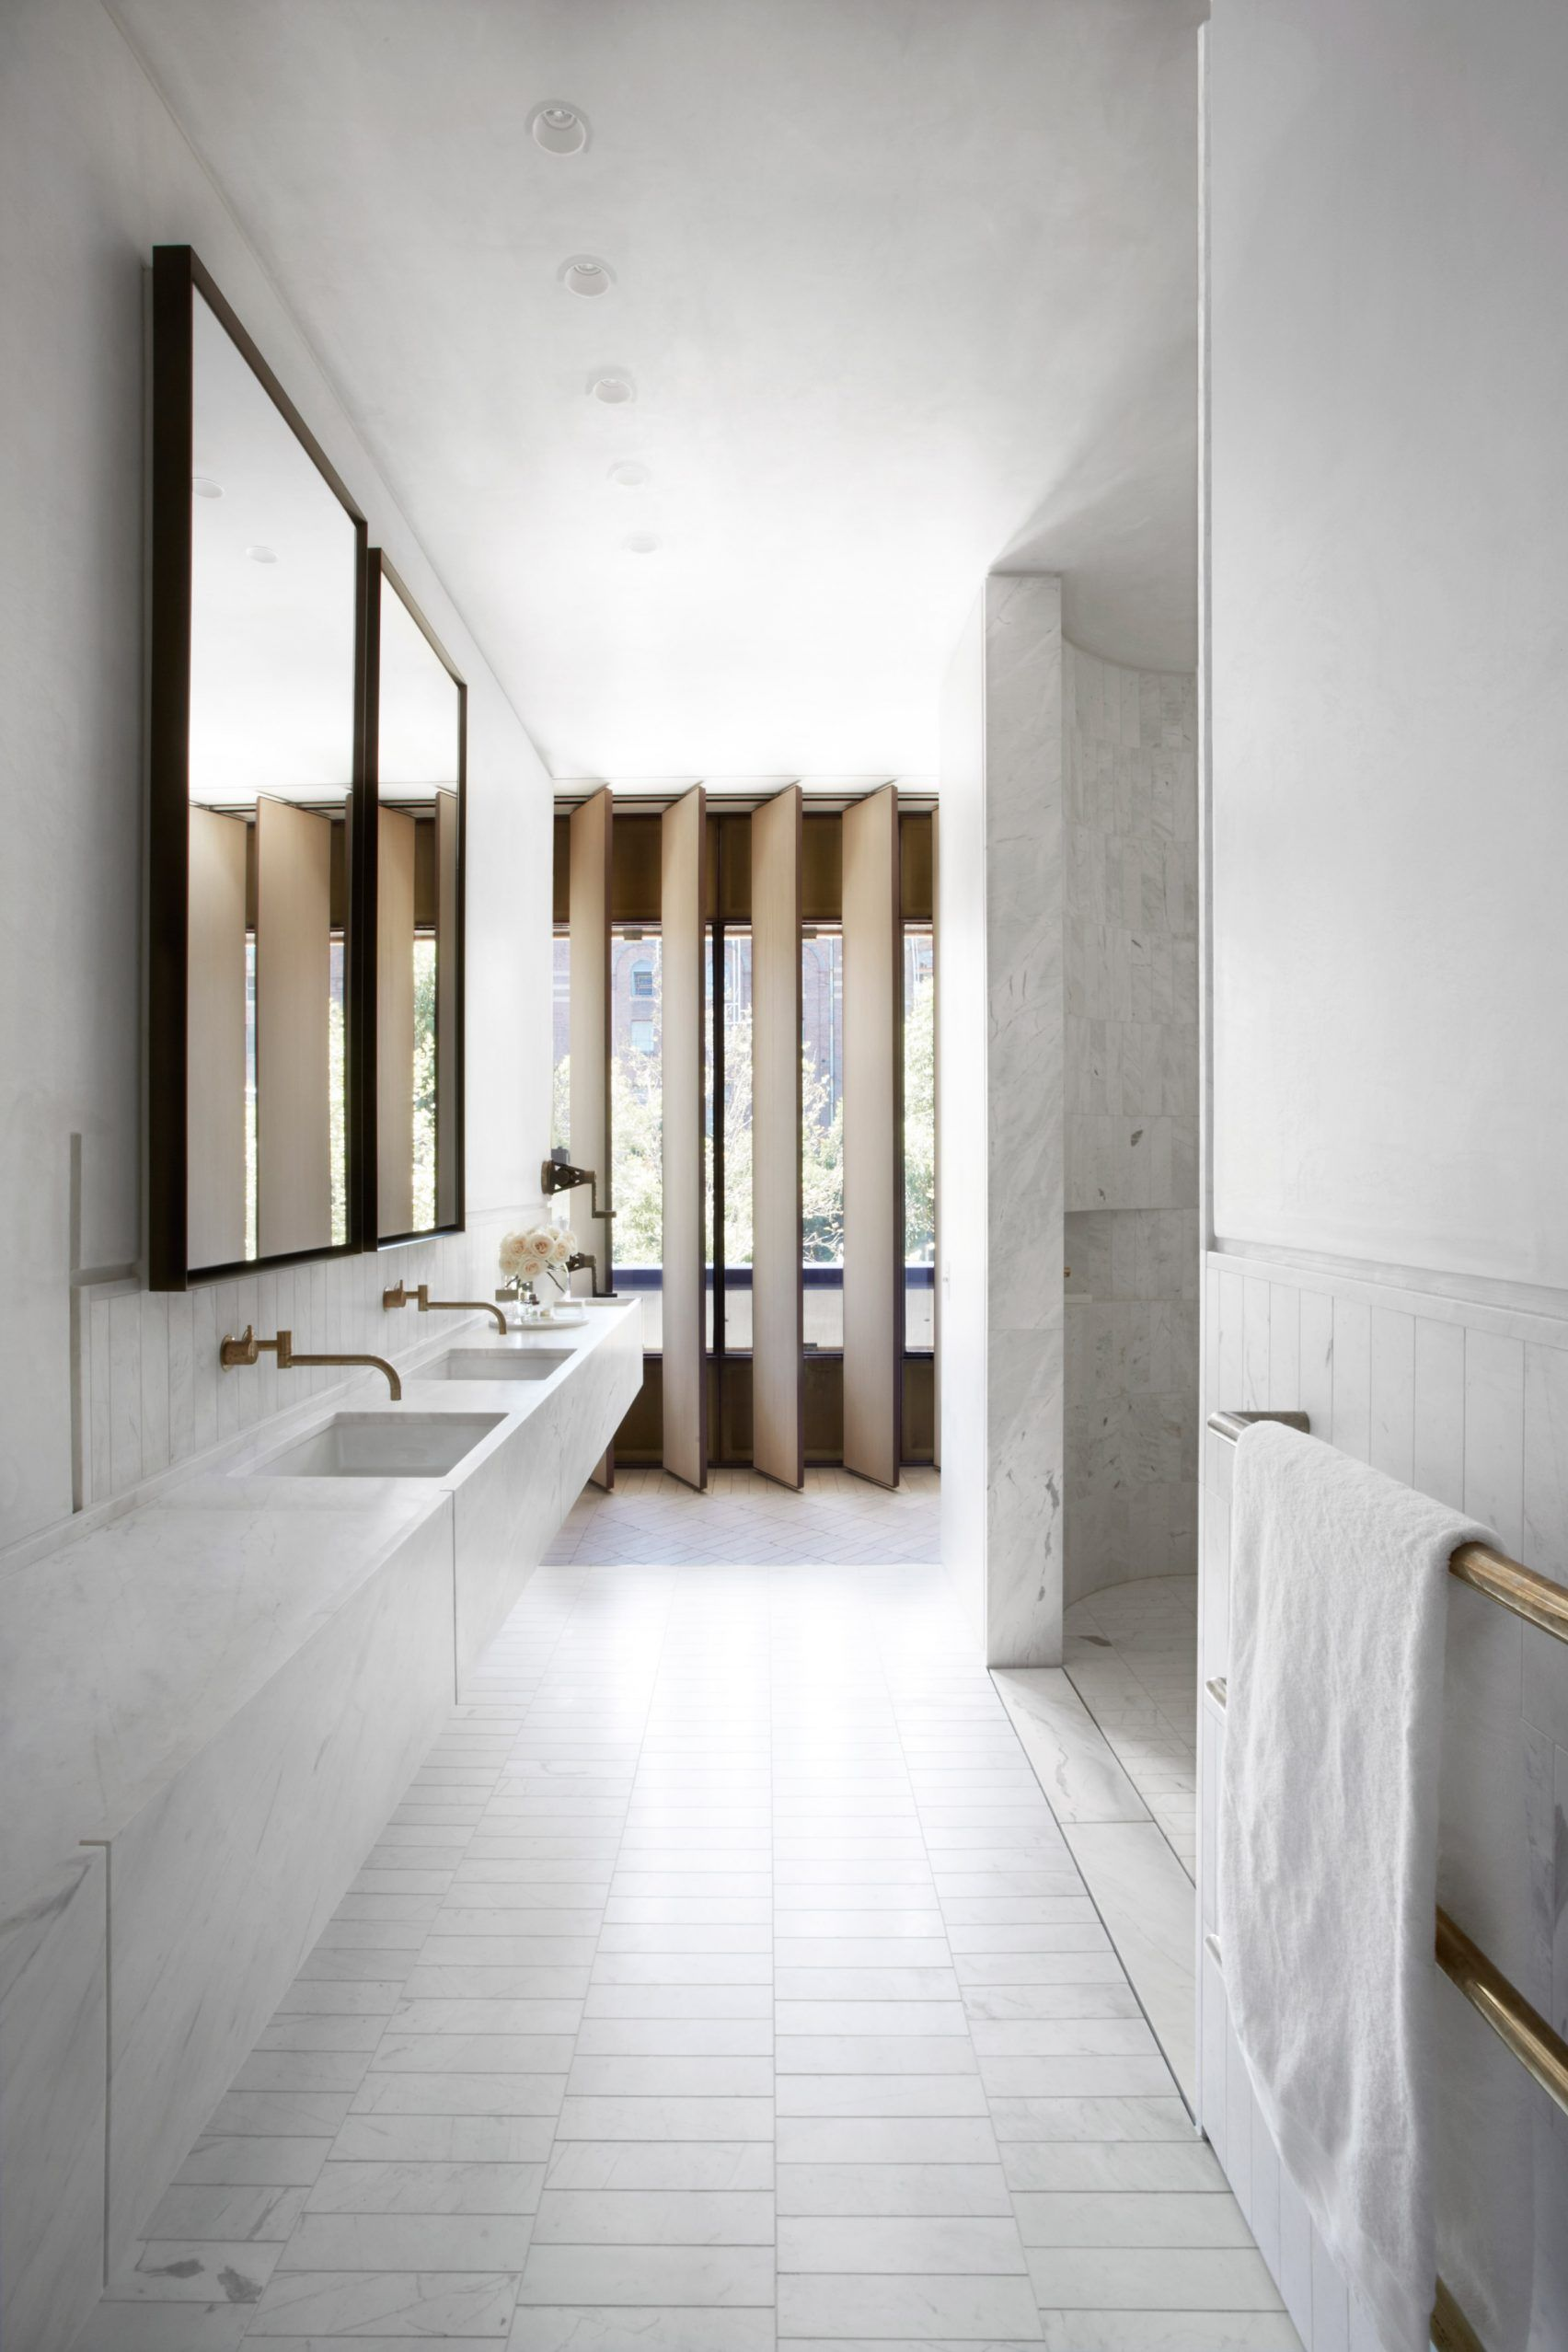 Smart Bathroom Design Sculptural Facade Directs Daylight Into Smart Design Studio's